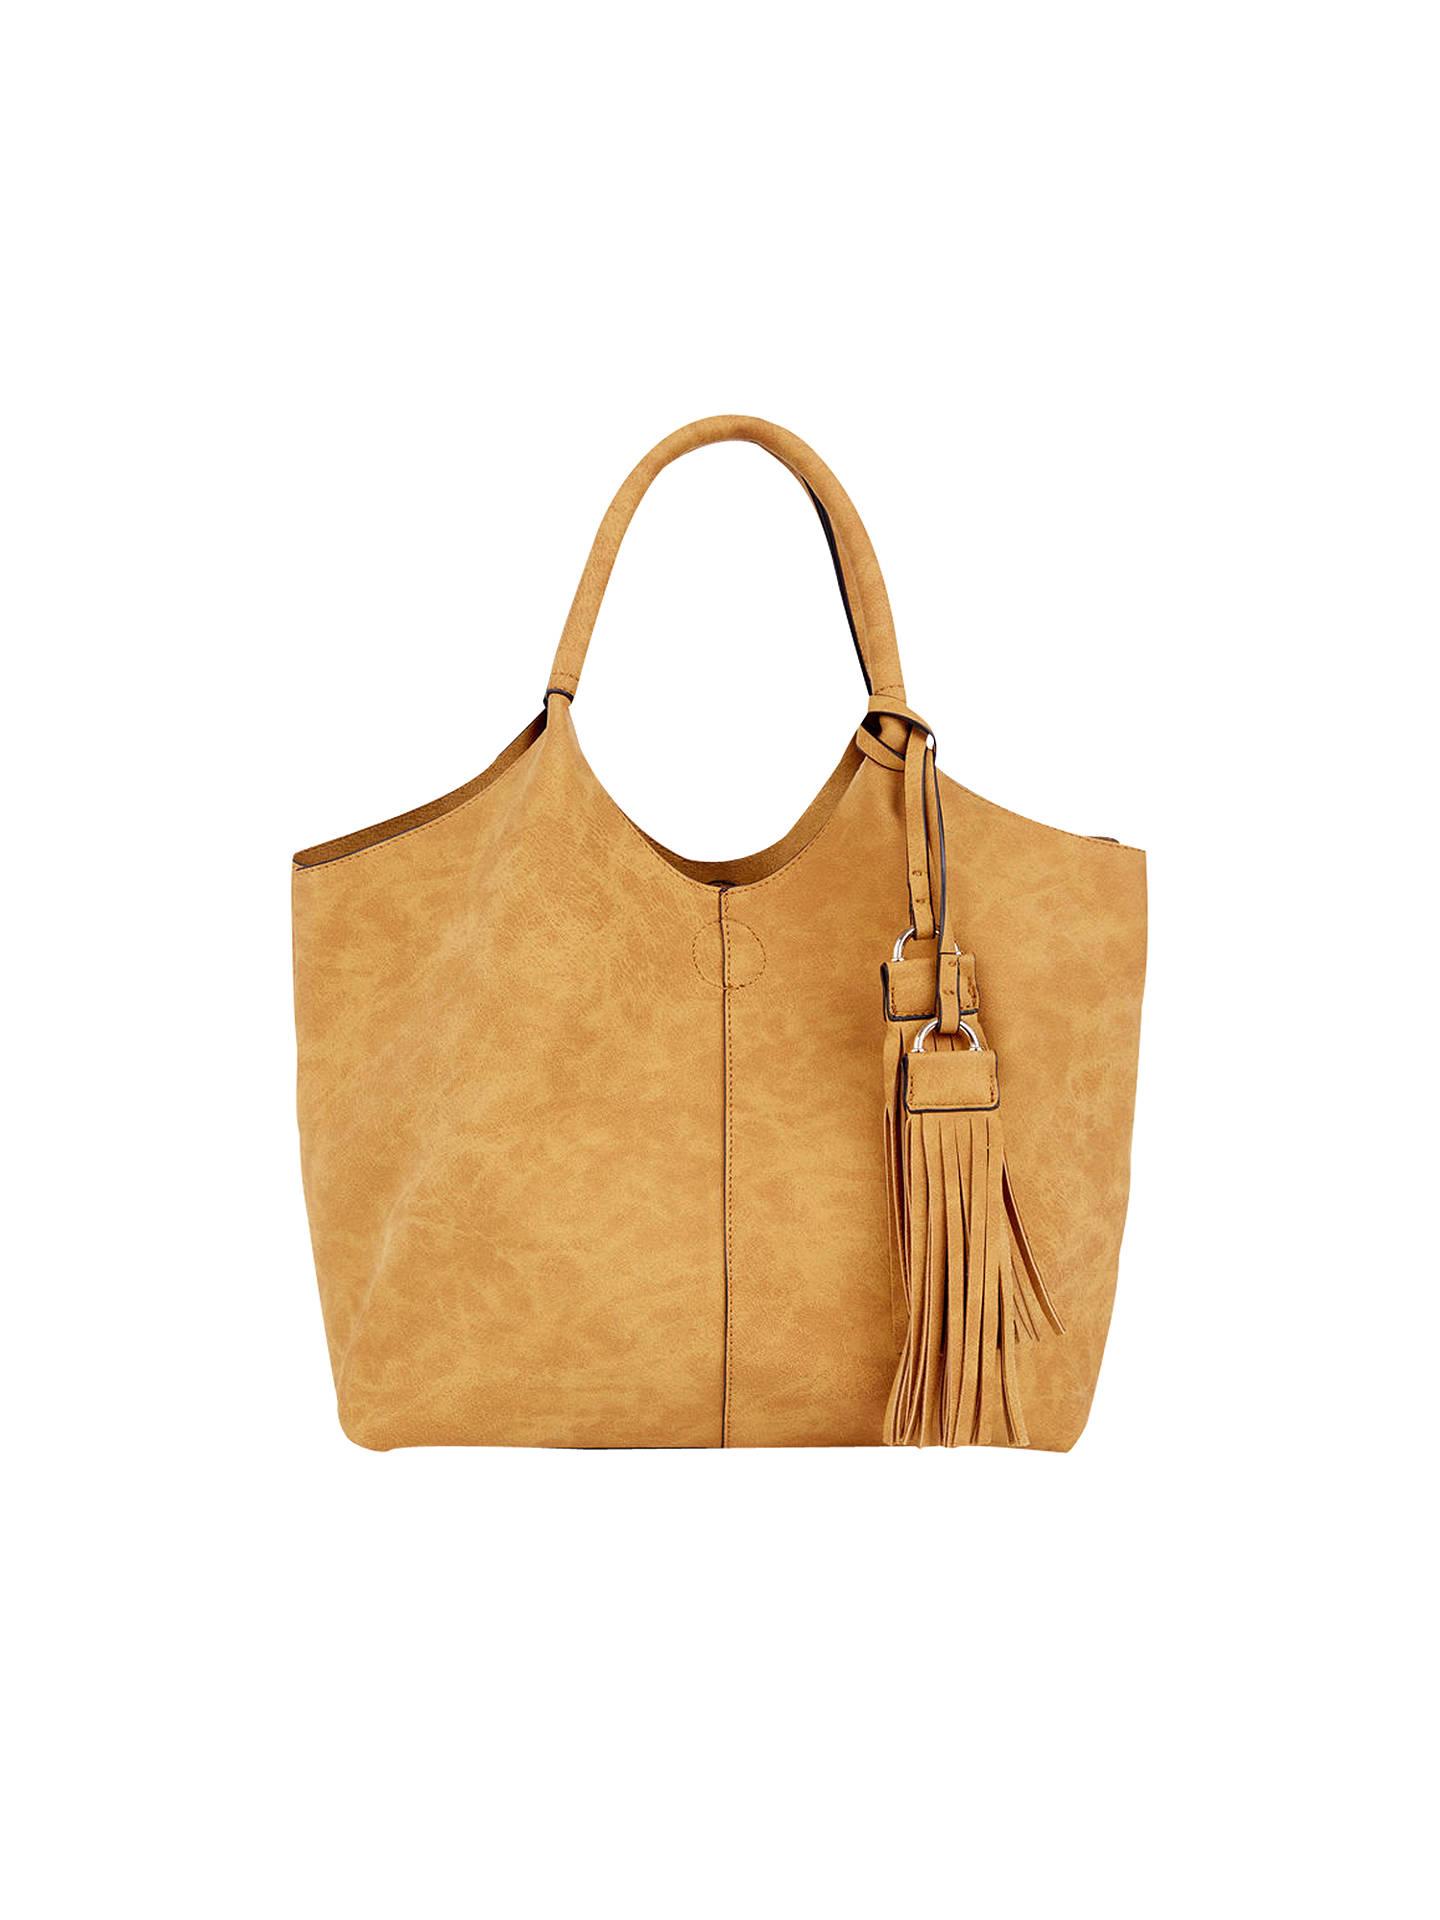 47581334d769 Buy Oasis Maggie Tote Bag, Ochre Online at johnlewis.com ...